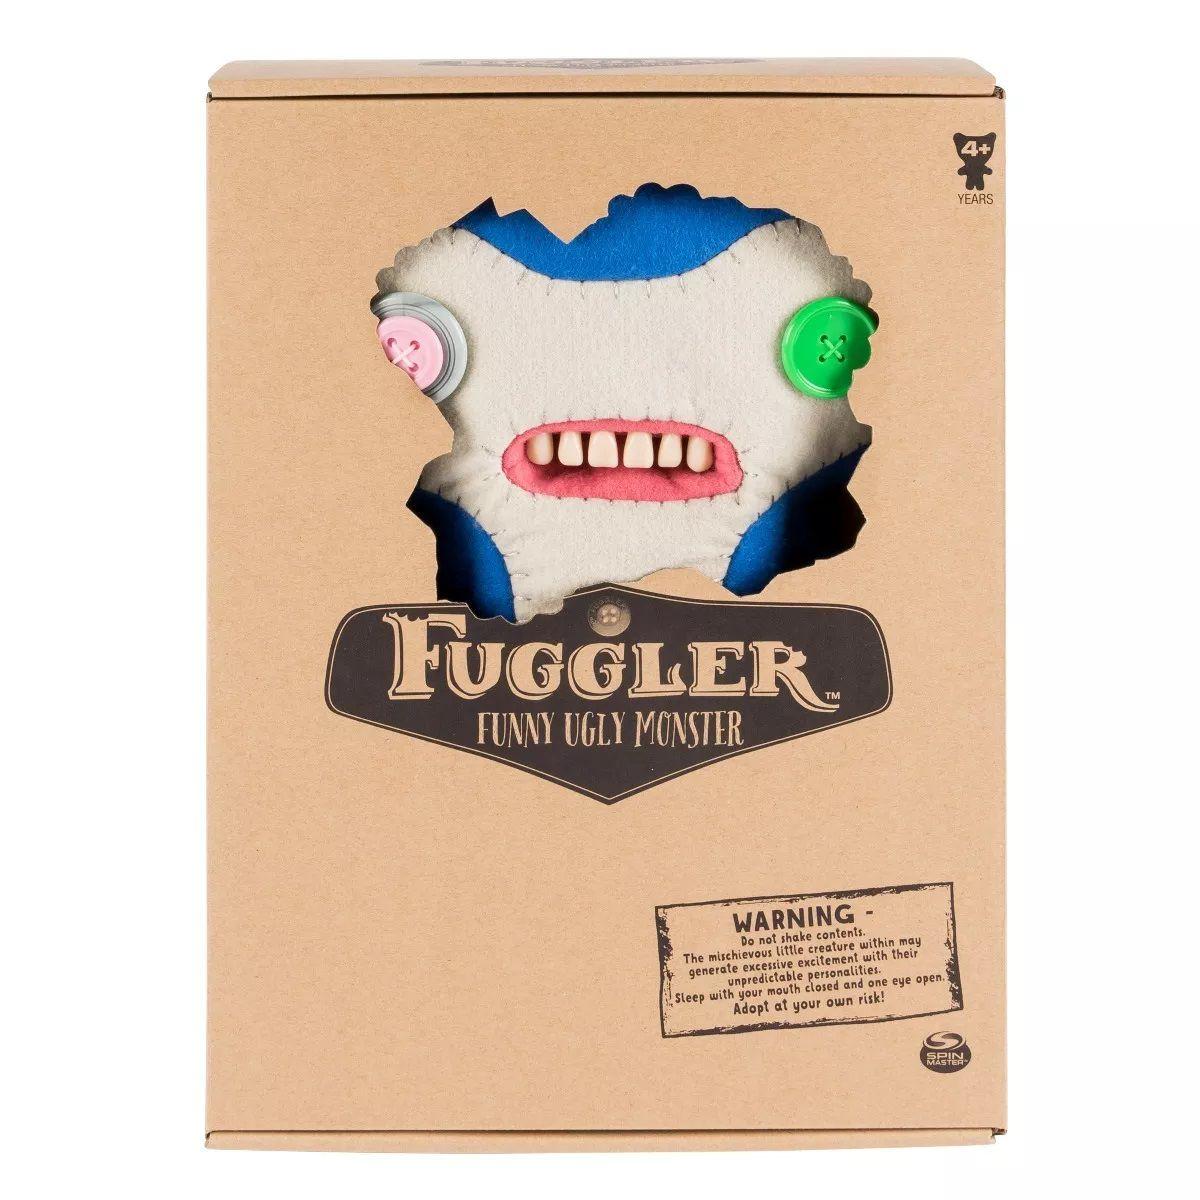 Pelúcia Monstruosa Azul Grande Fuggler Funny Ugly Monster 1916 Sunny